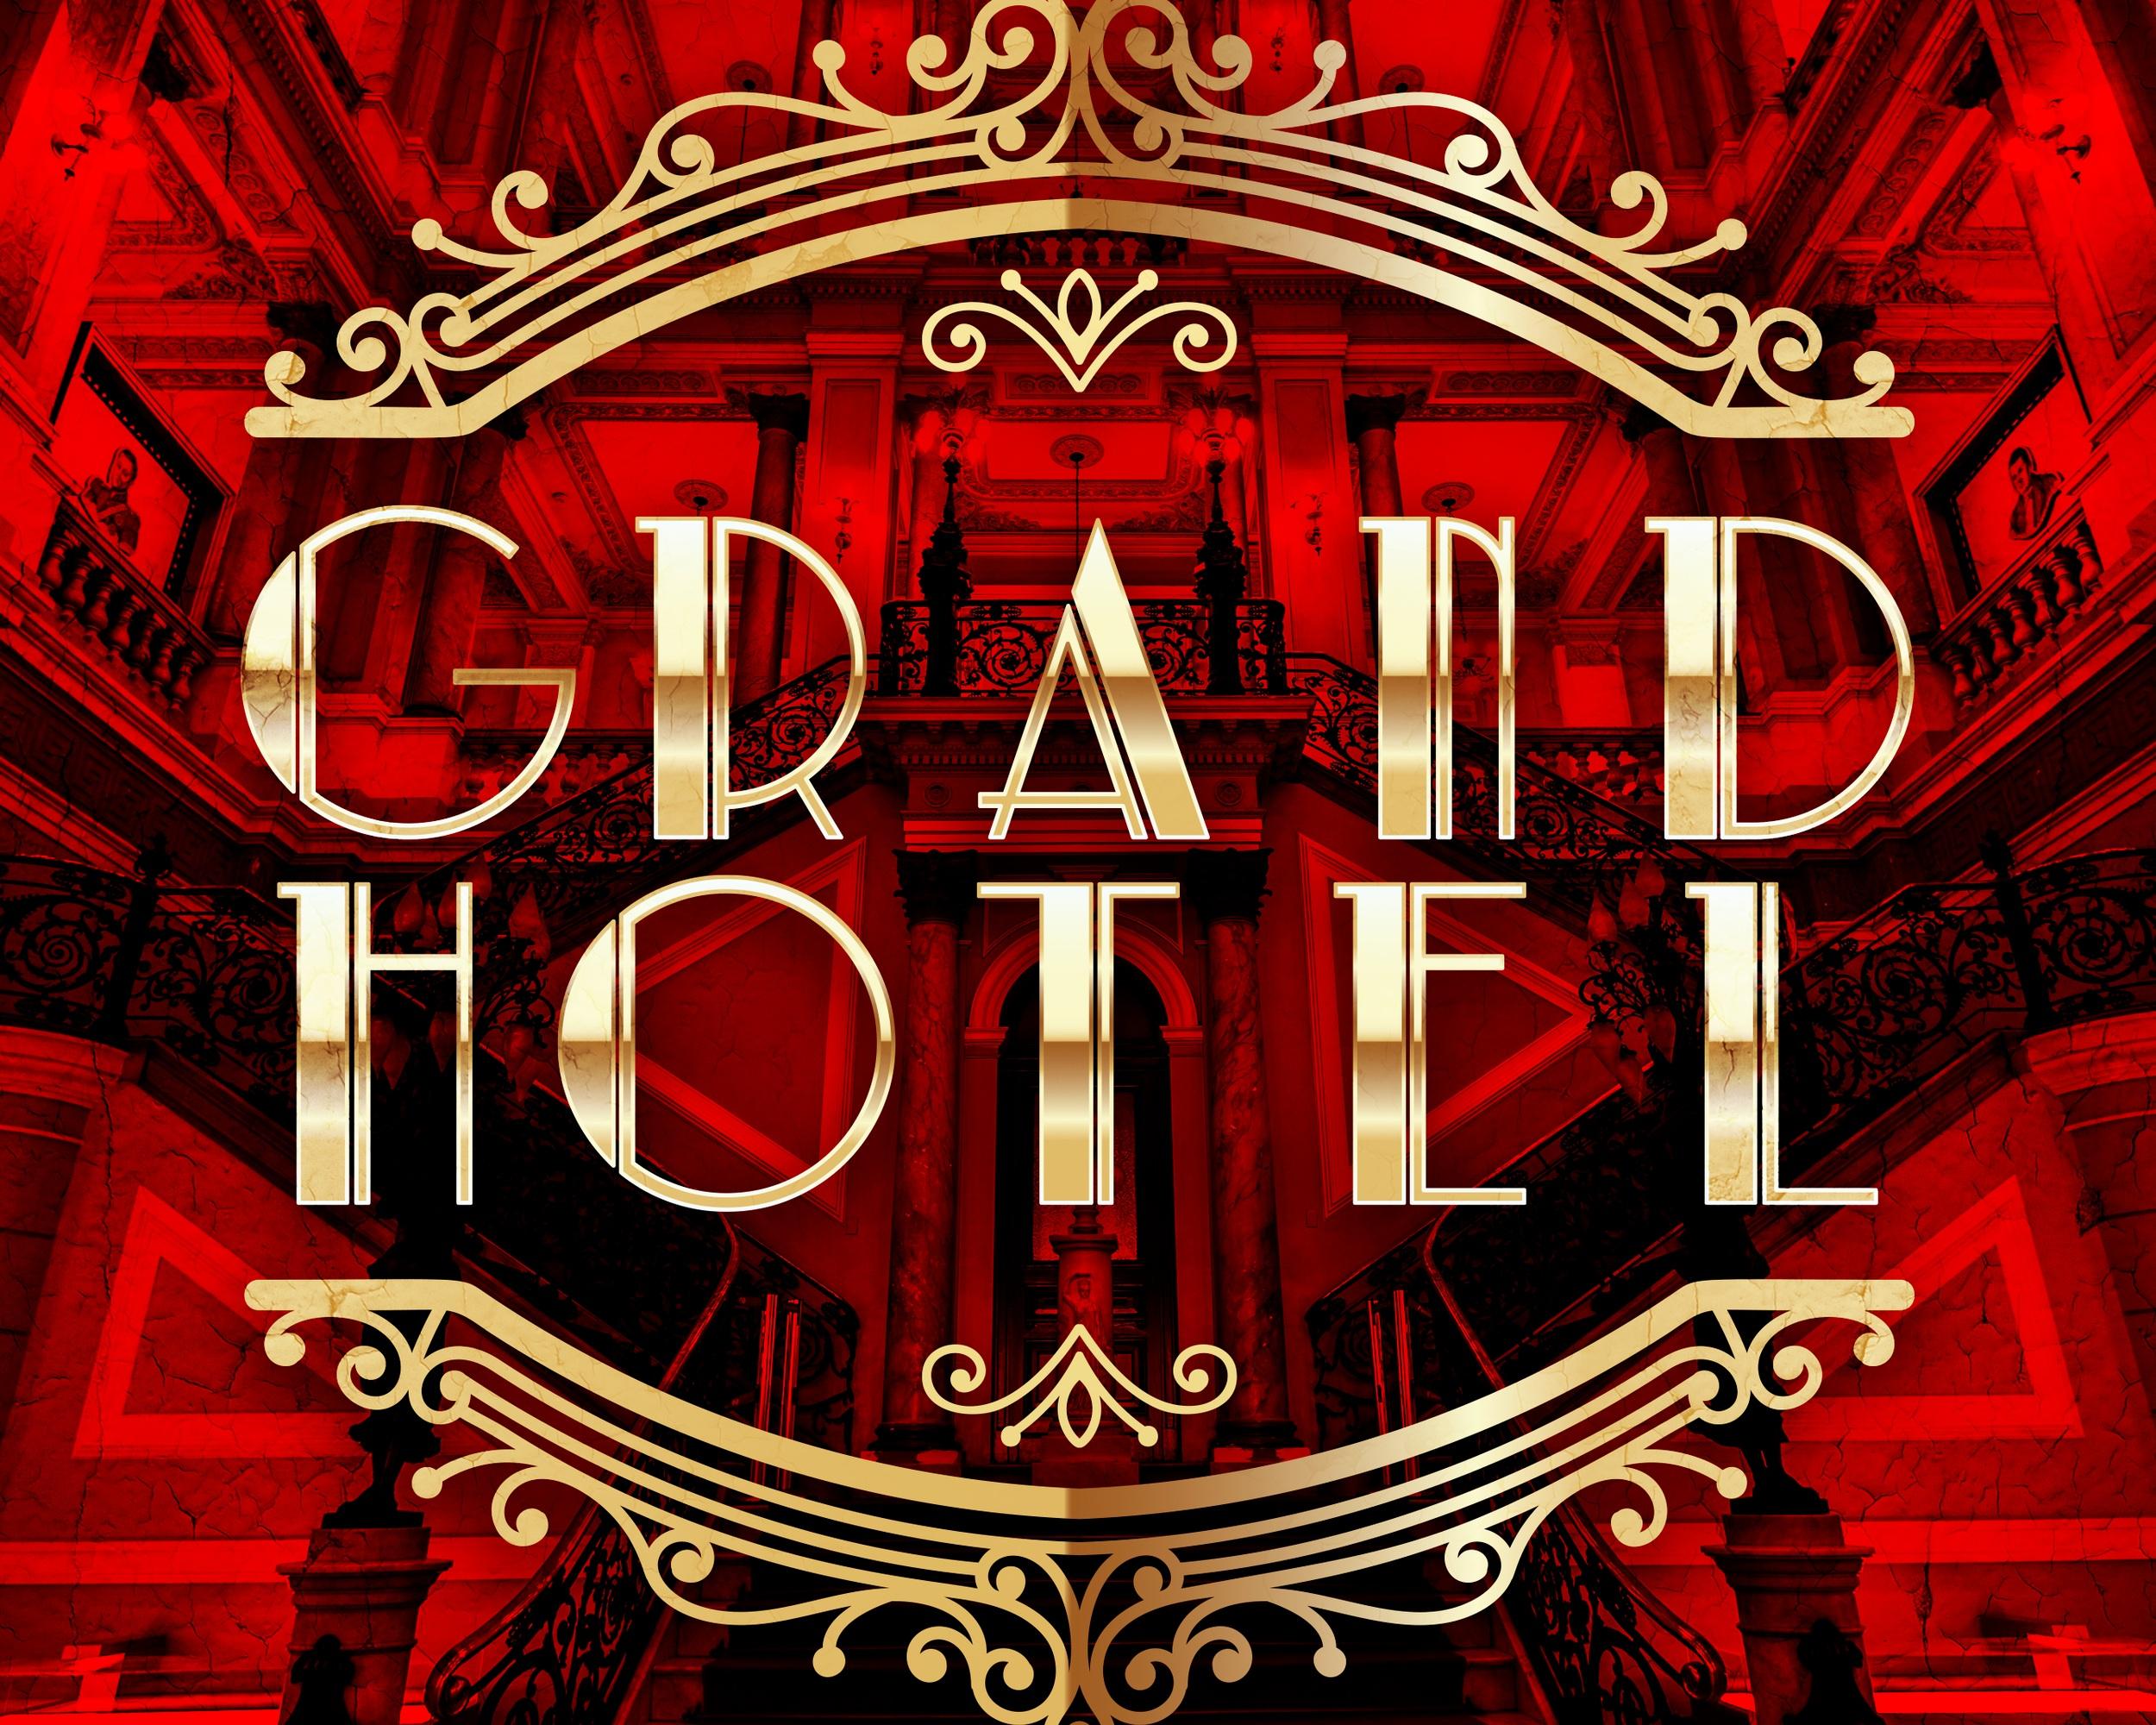 Grand_Hotel_F_b_square.jpg